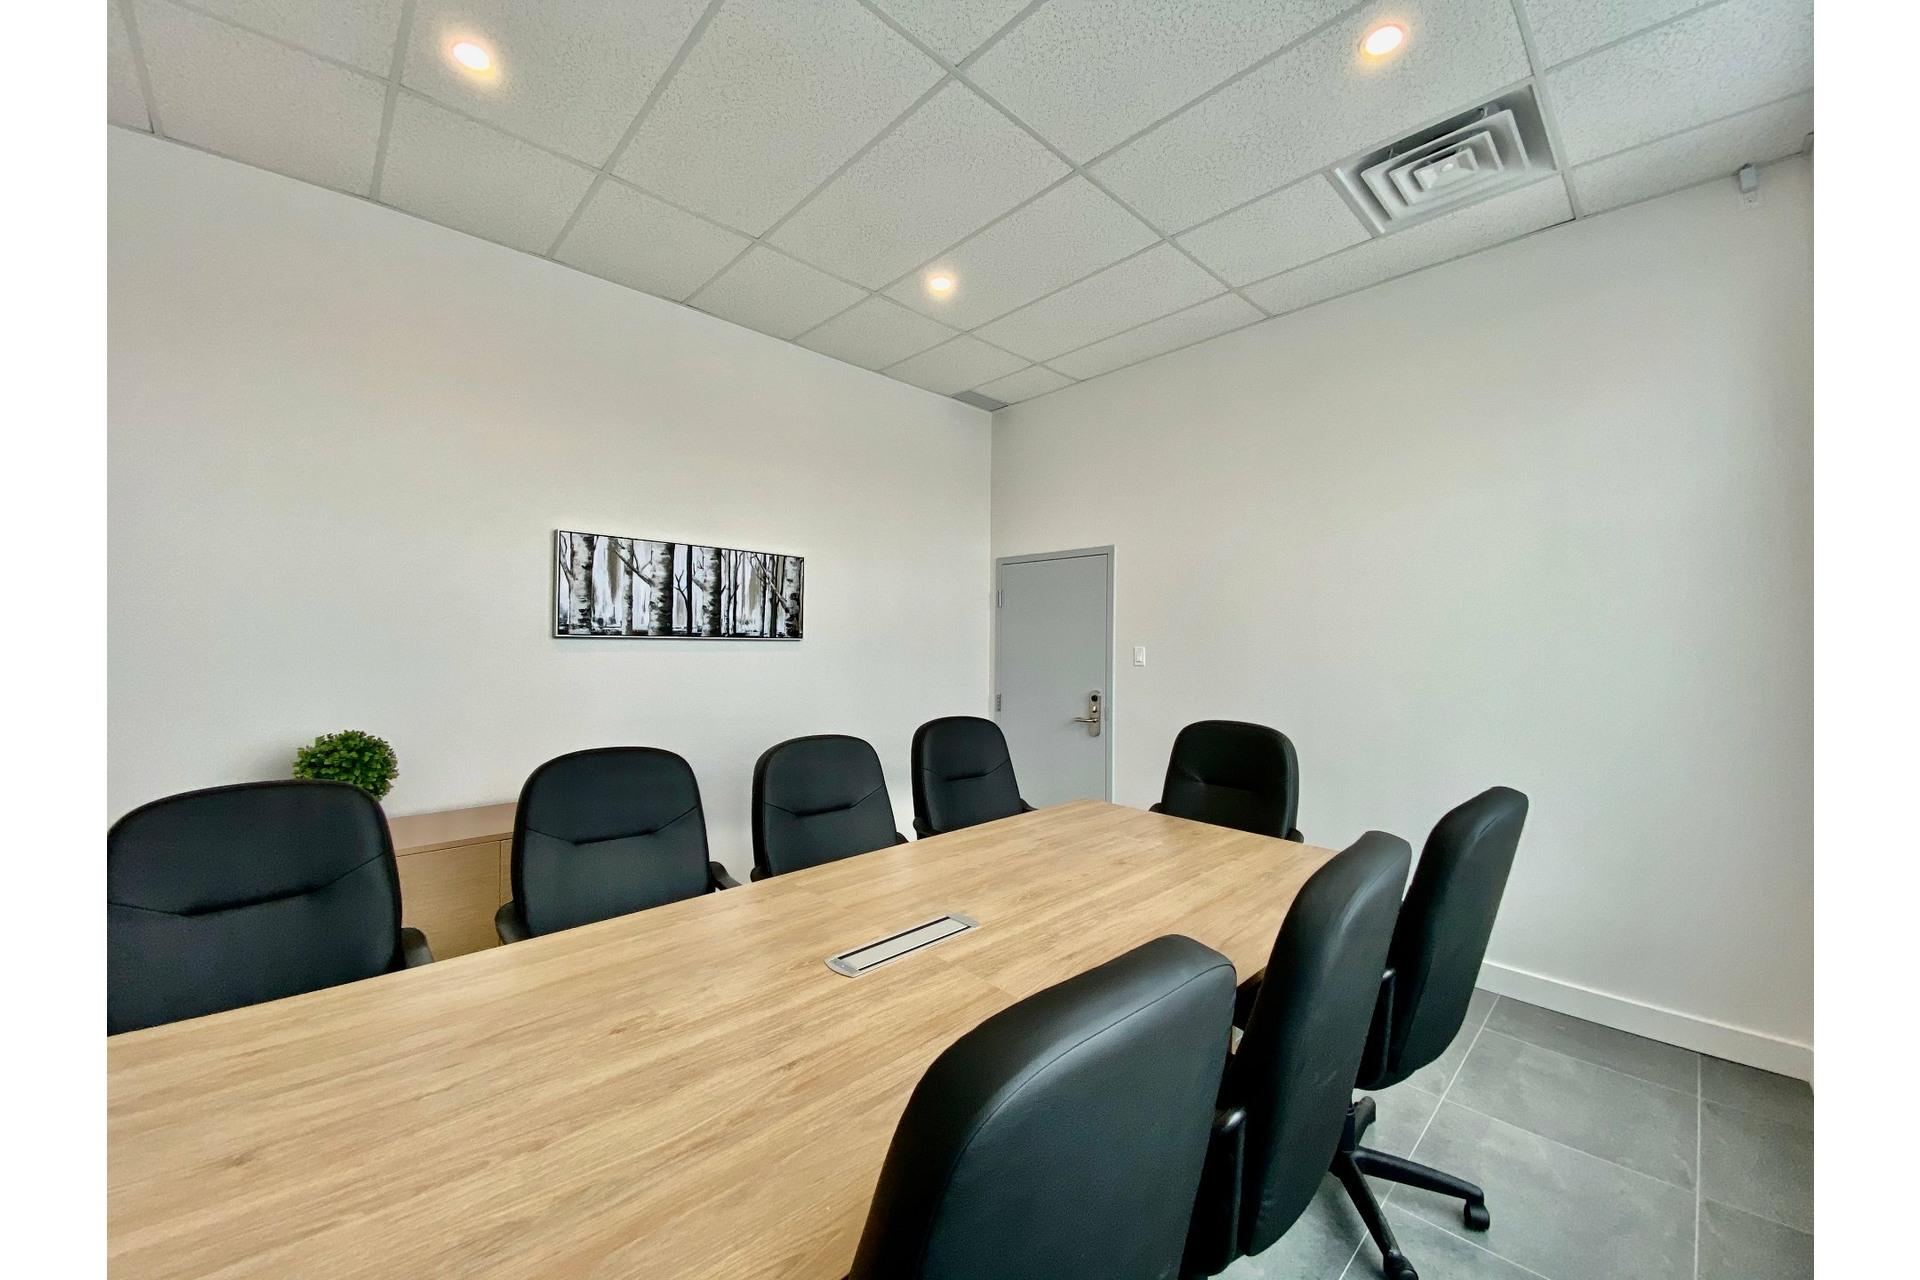 image 5 - MX - Oficina - MX Para alquiler Pierrefonds-Roxboro Montréal